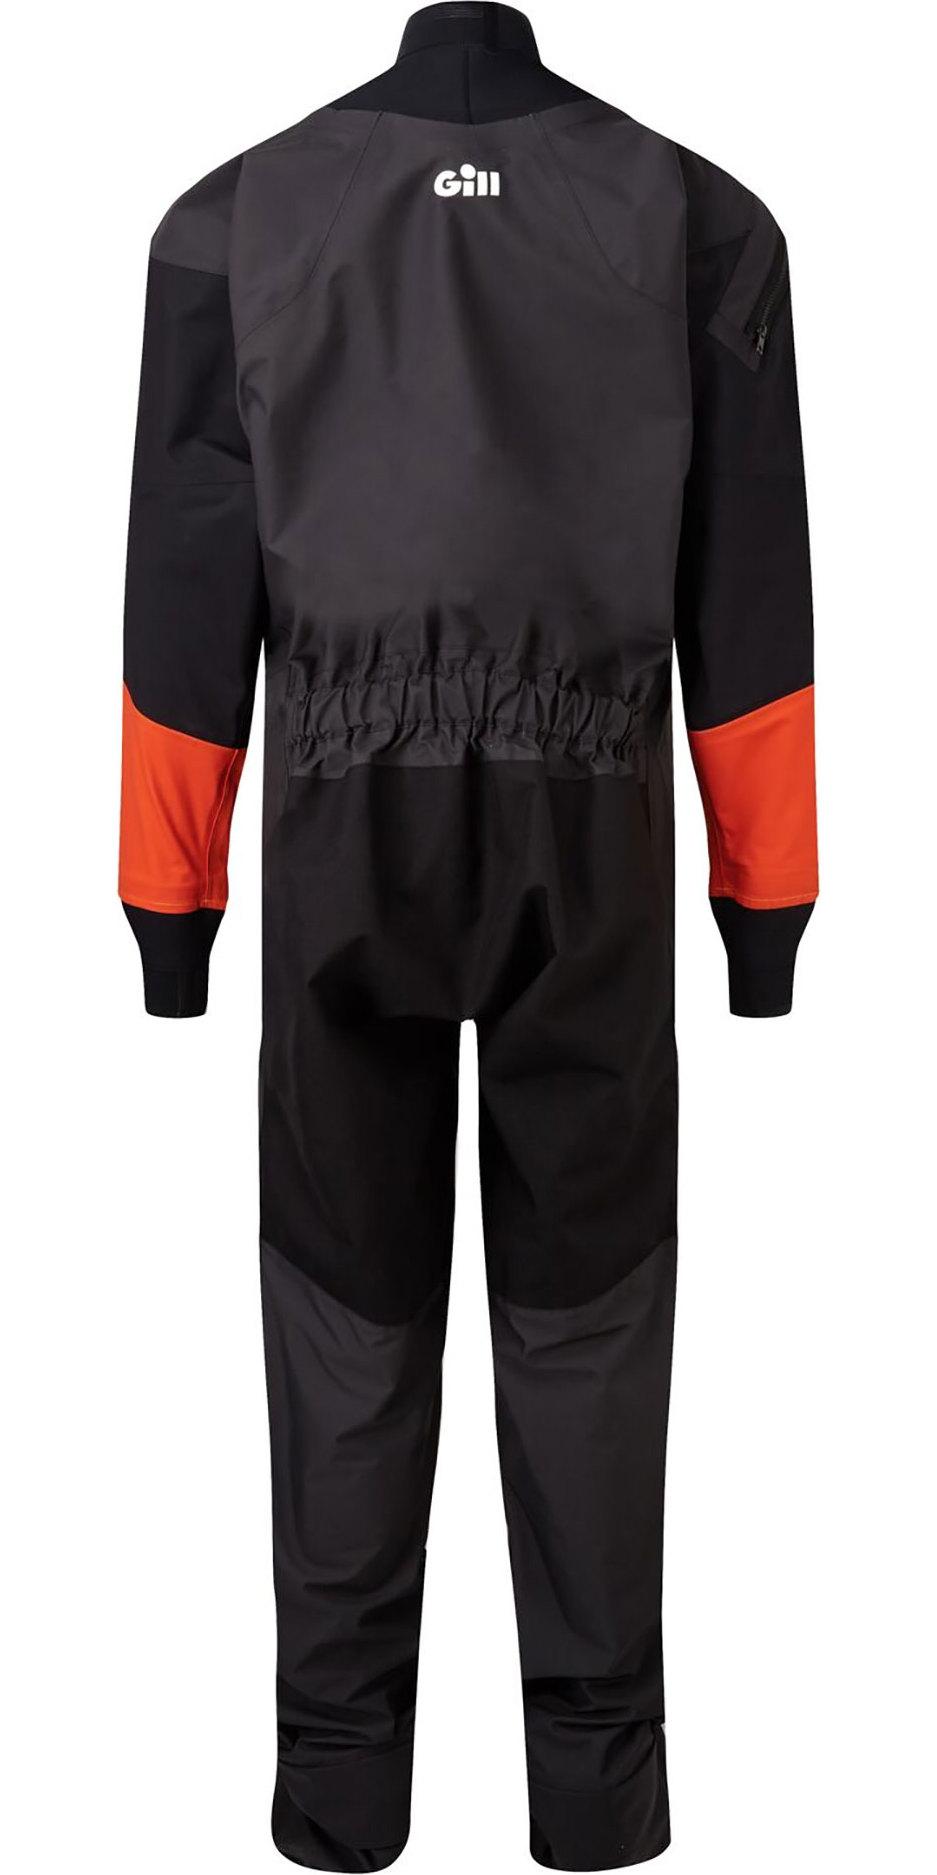 2019 Gill Drysuit Preto 4804